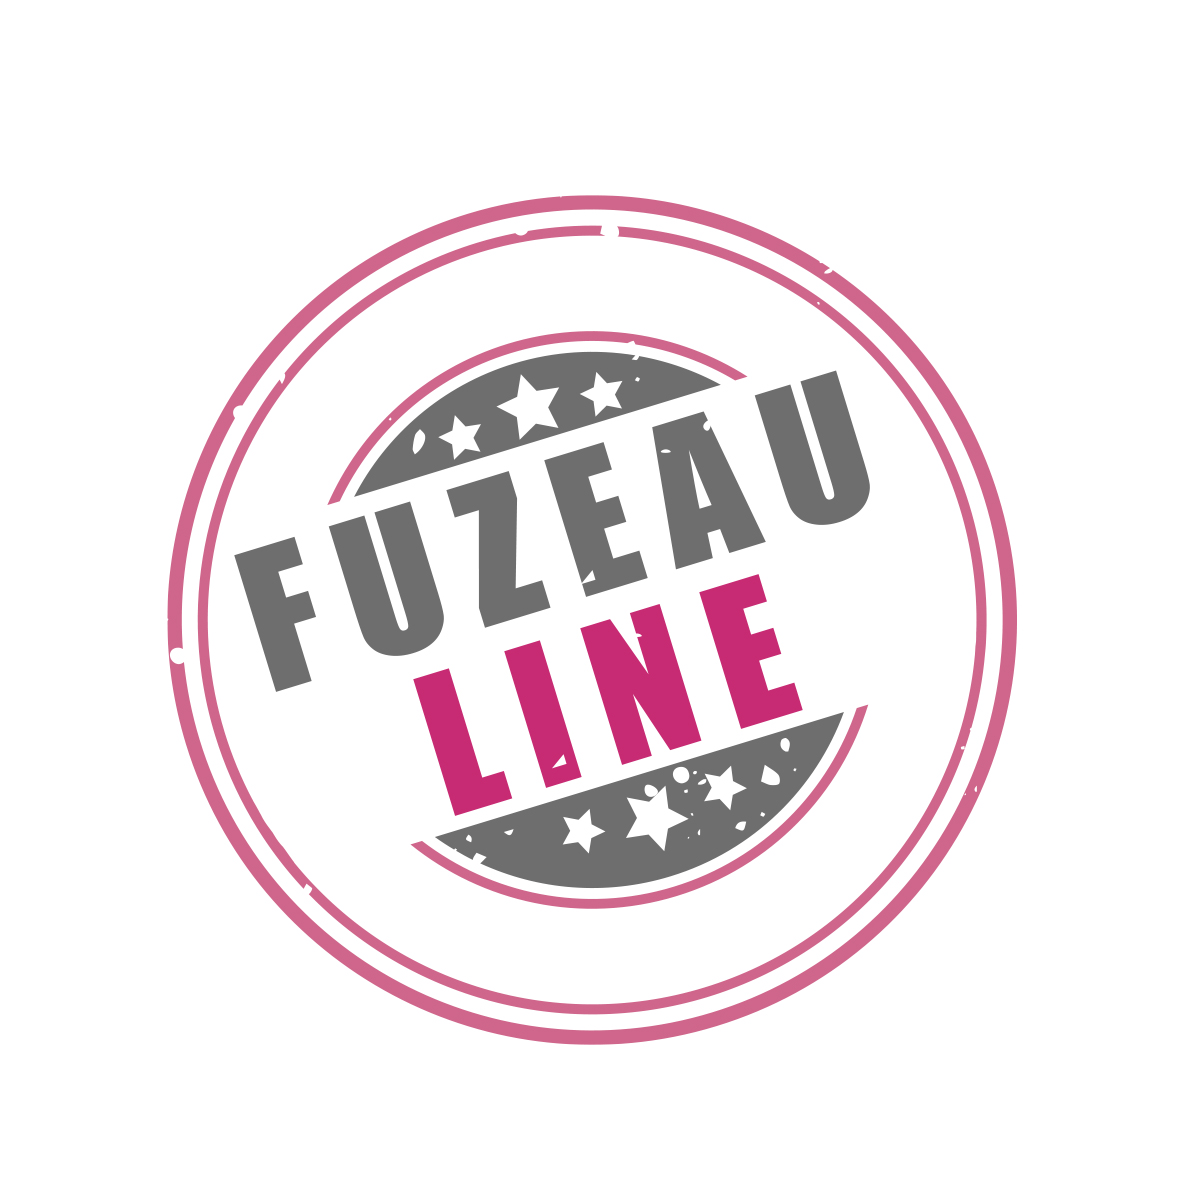 LOGO FUZEAU LINE